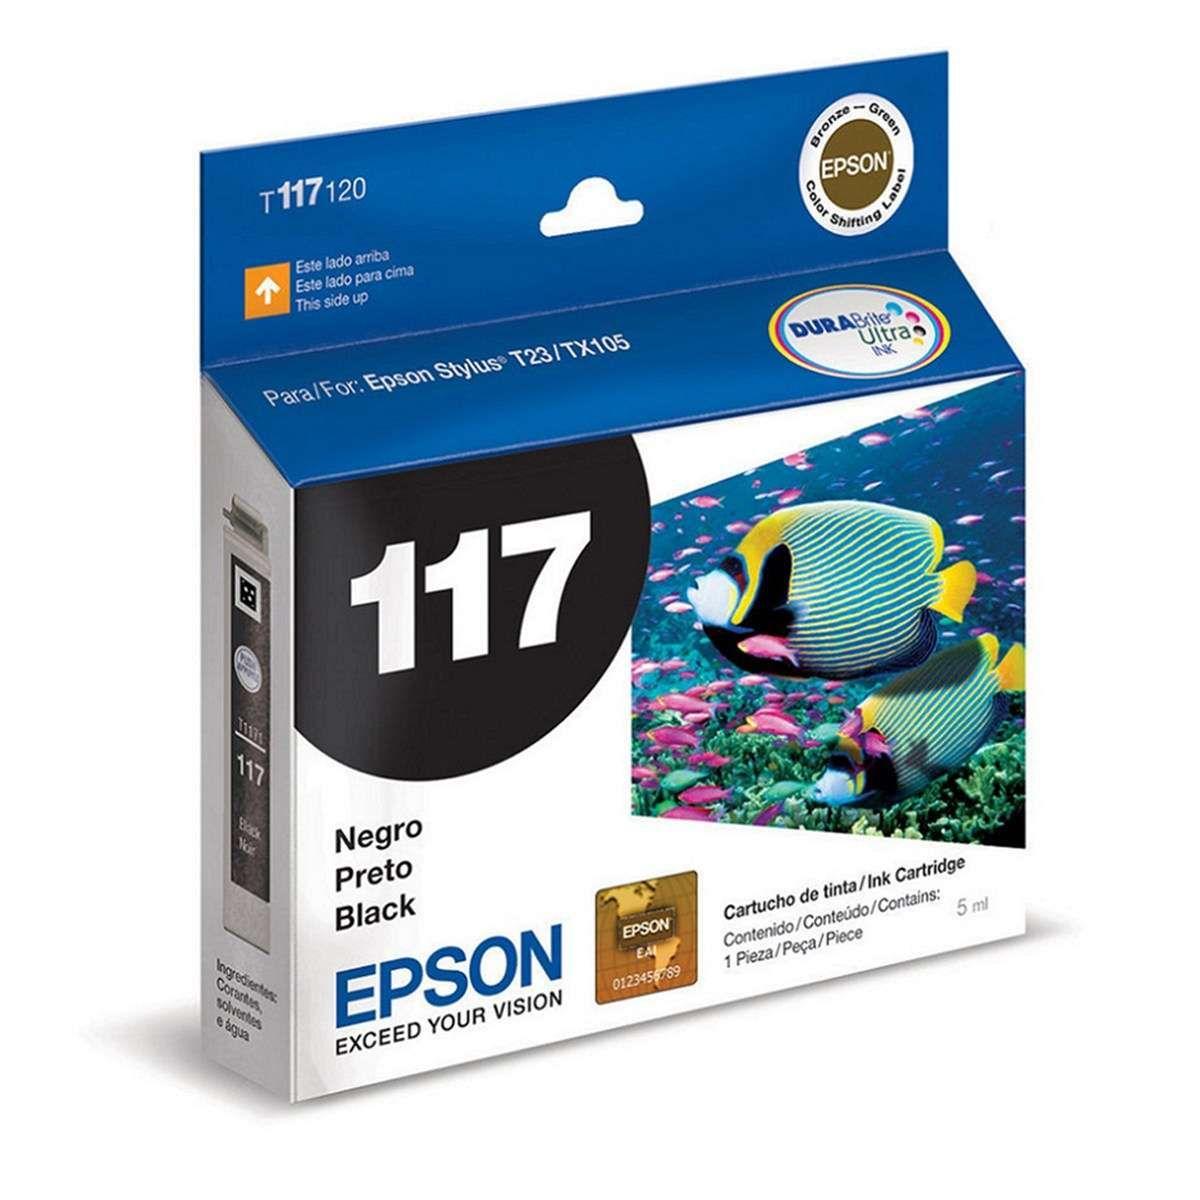 Cartucho de Tinta Epson T117120-BR Preto 5ml